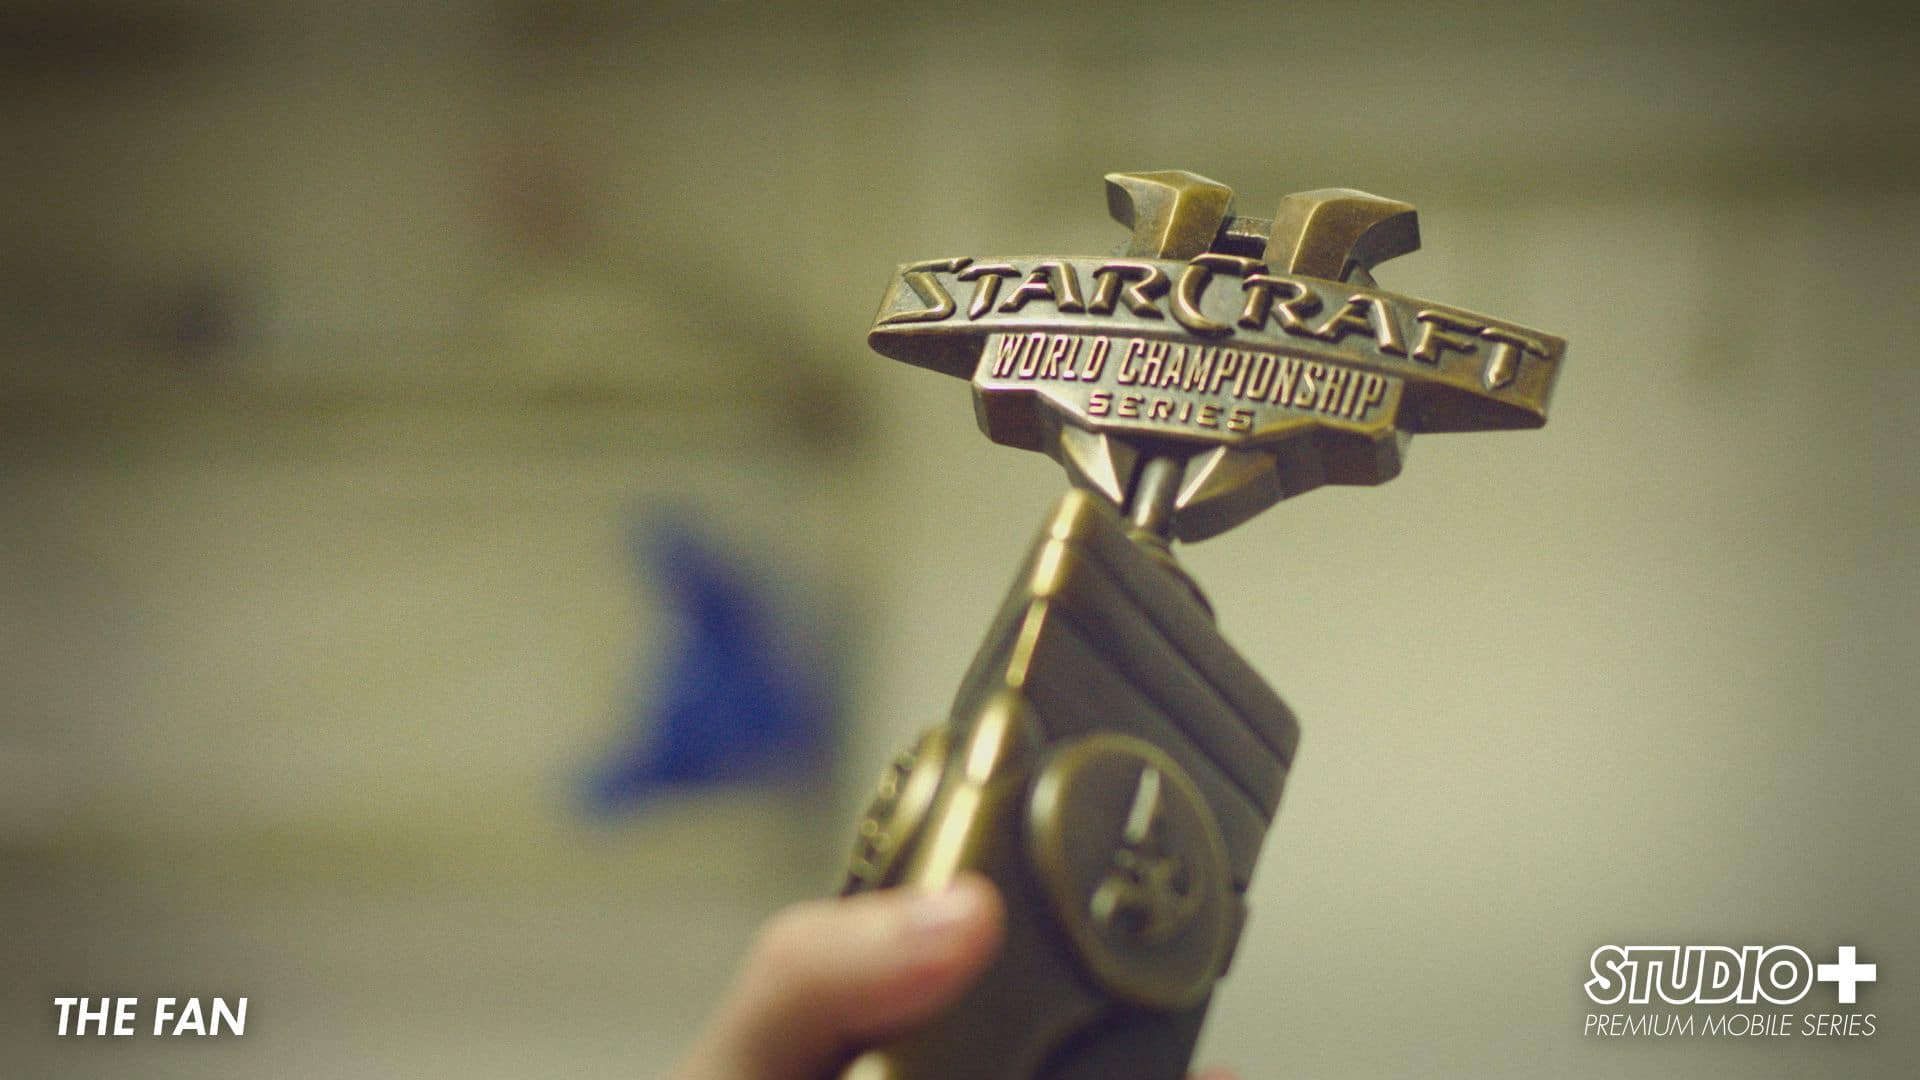 The Fan Studio+ Starcraft 2